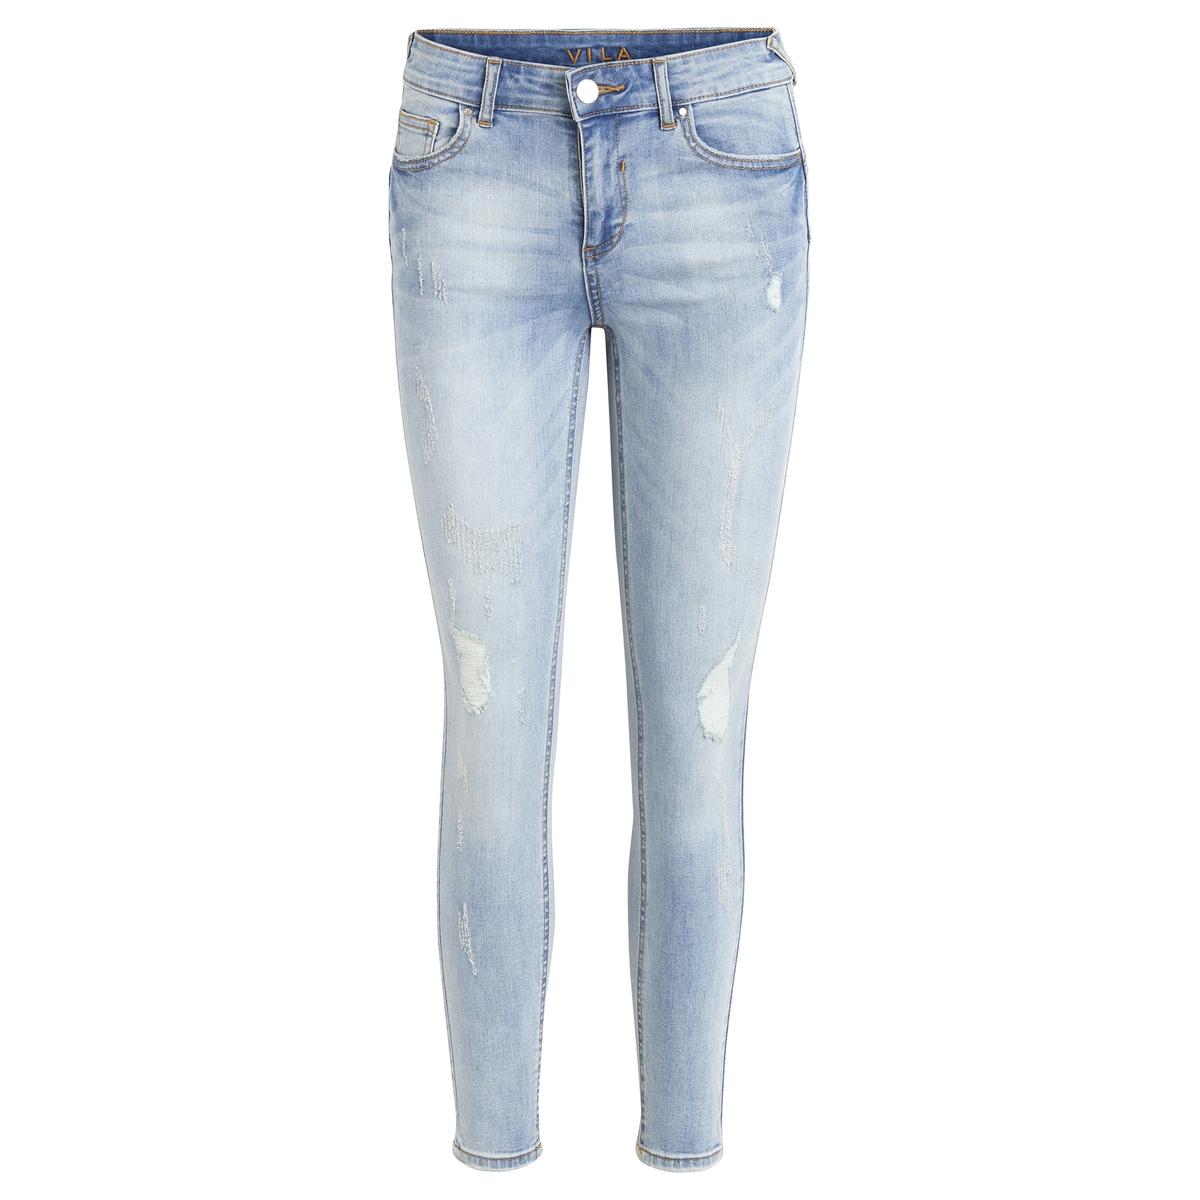 Джинсы узкие джинсы узкие insight skinny merlot